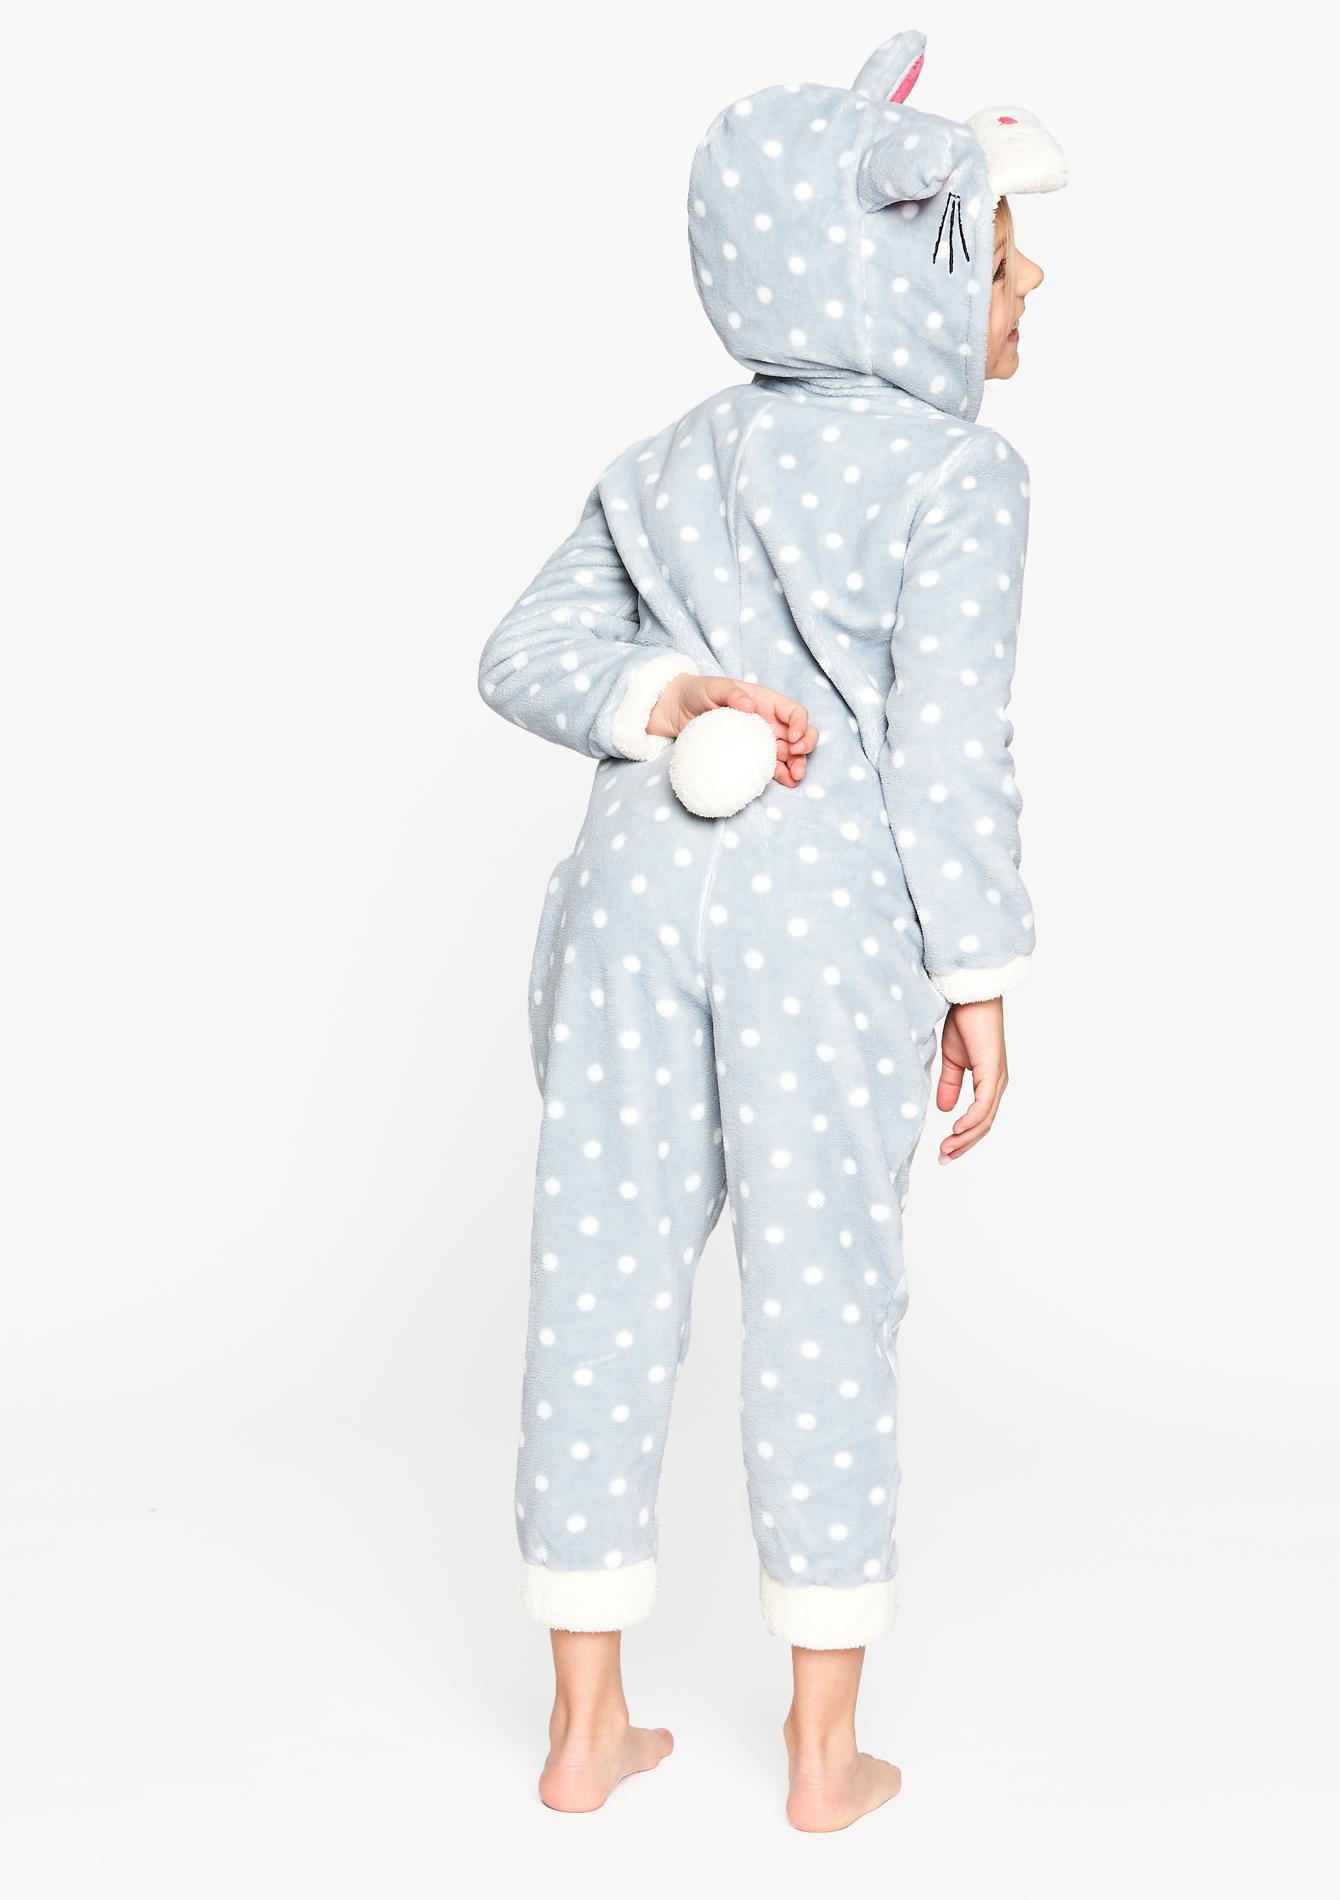 combinaison pyjama enfant lapin lolaliza. Black Bedroom Furniture Sets. Home Design Ideas